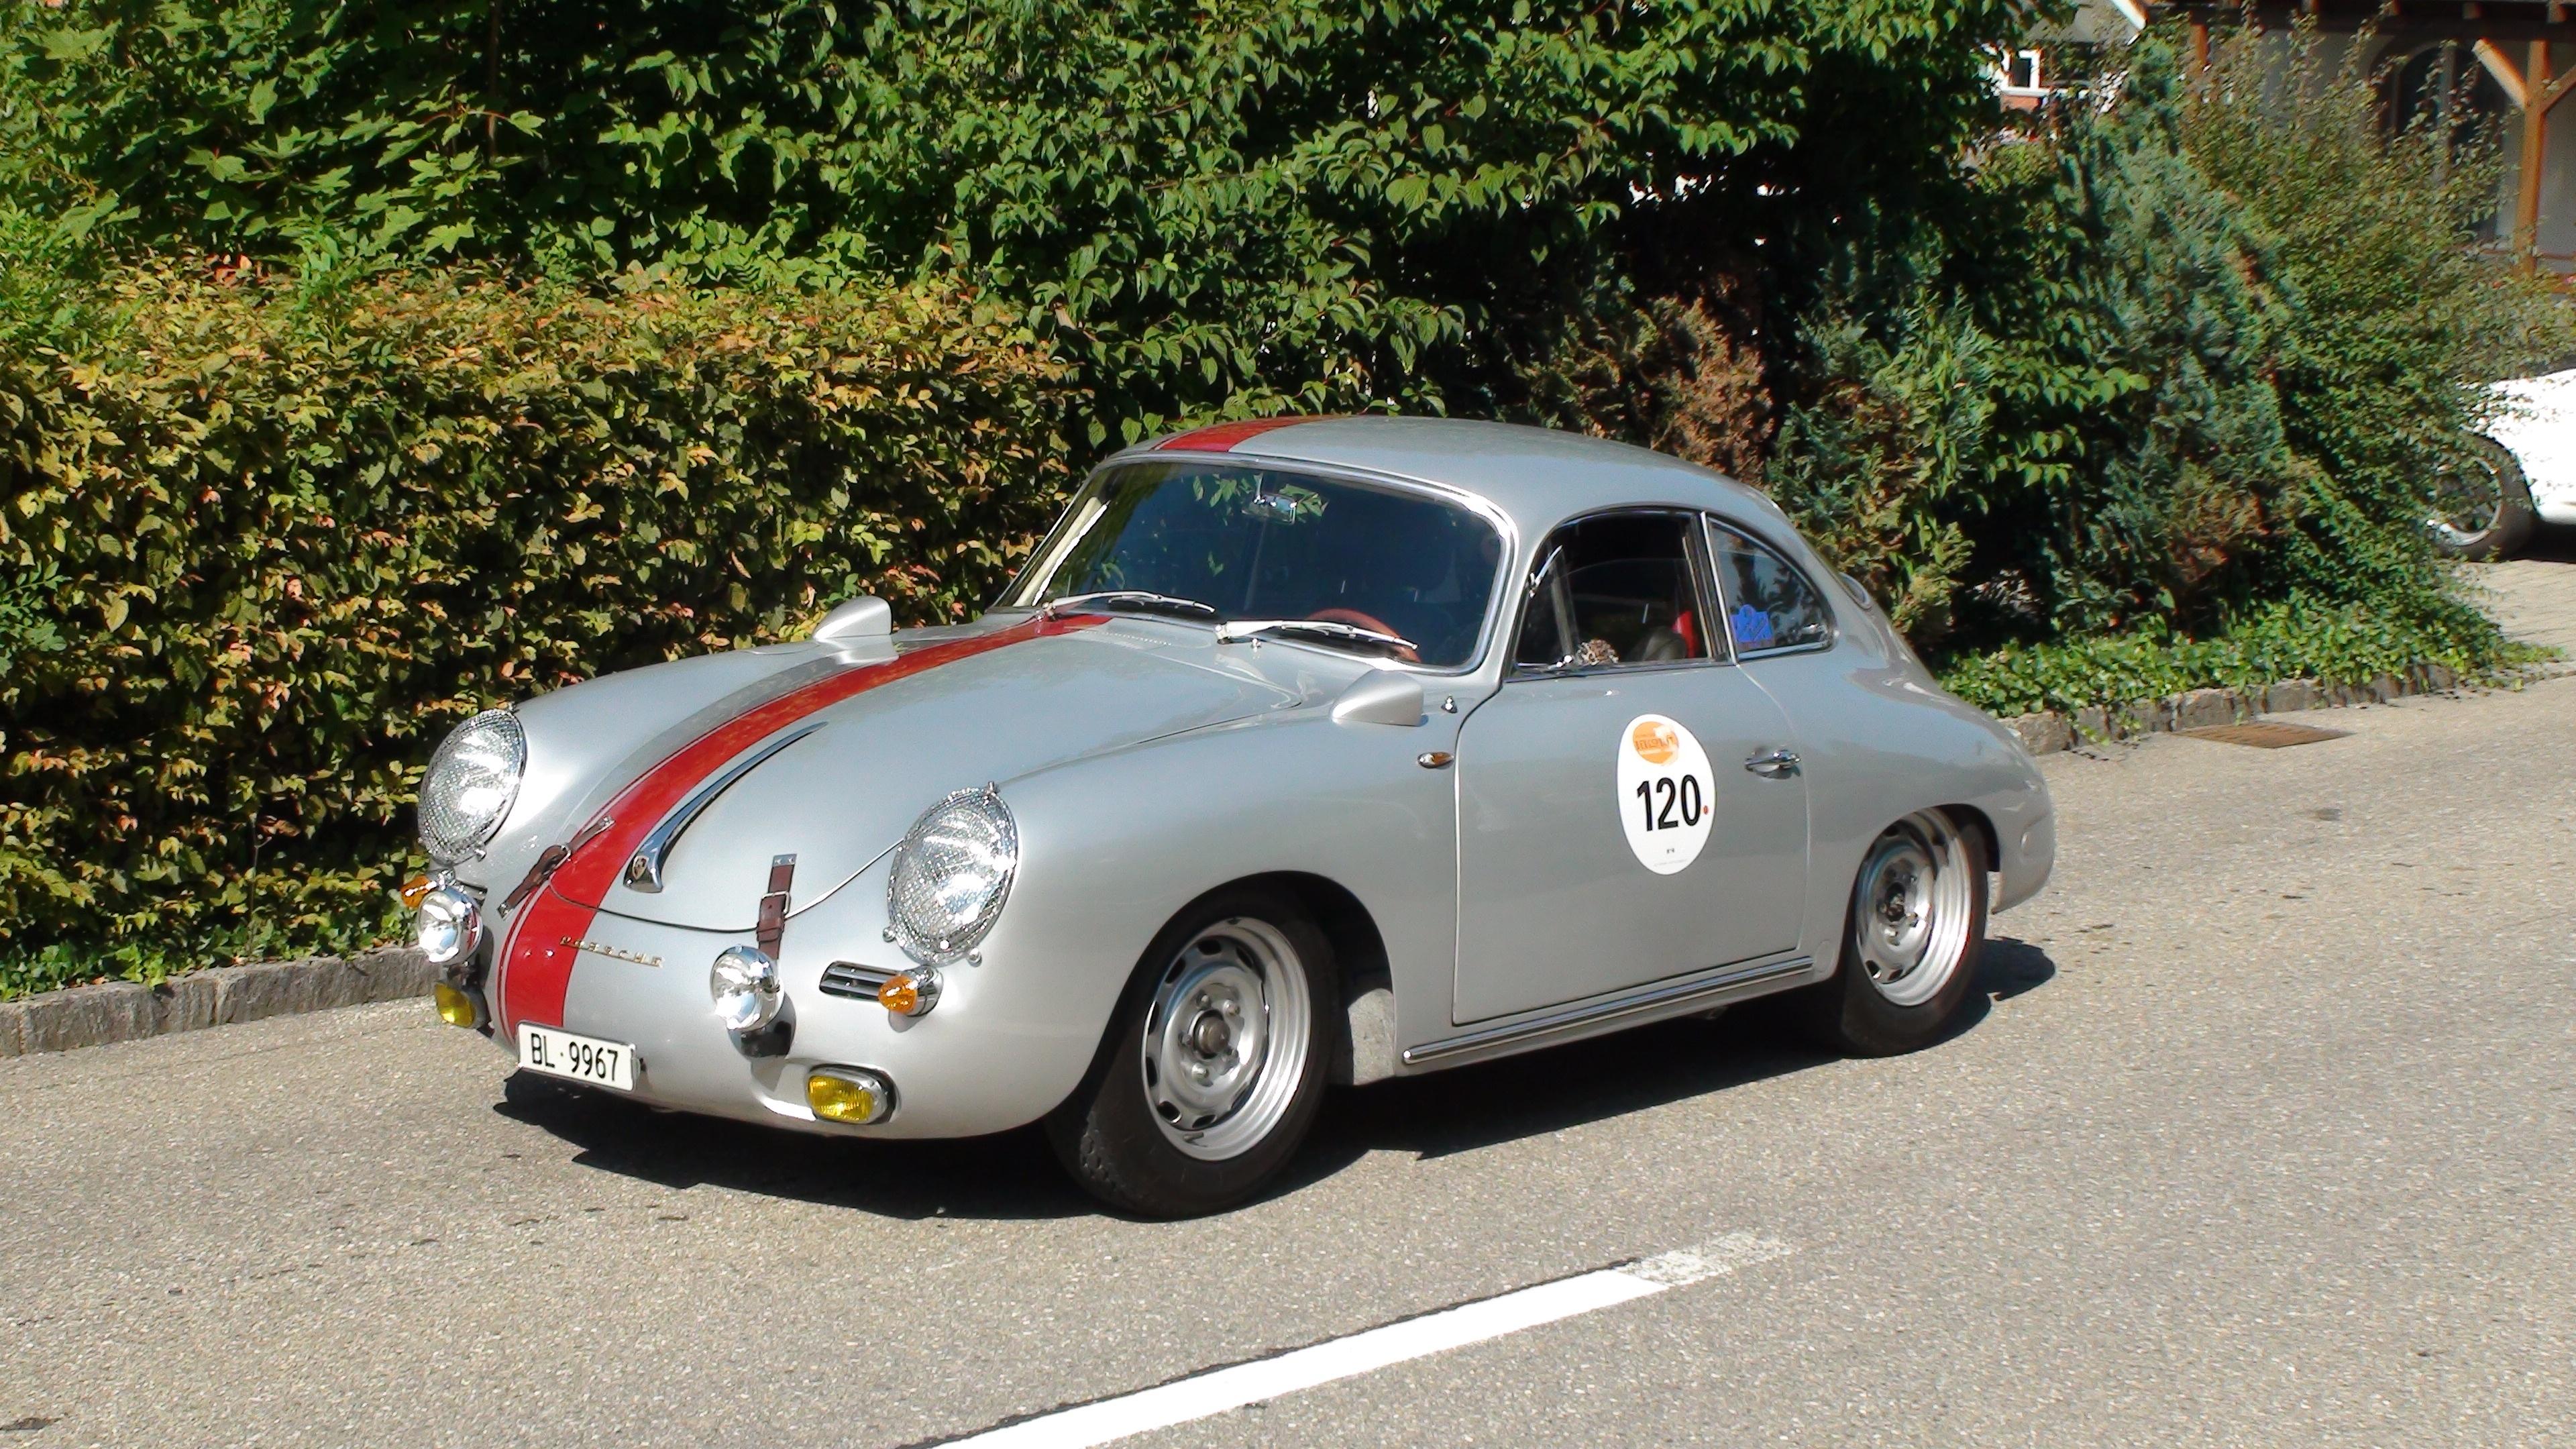 Attractive ... Auto, Classic Car, Sports Car, Oldtimer, Convertible, Antique Car, City  Car, Land Vehicle, Racing Porsche, Hillclimb, Walzenhausen, Volkswagen  Beetle, ...